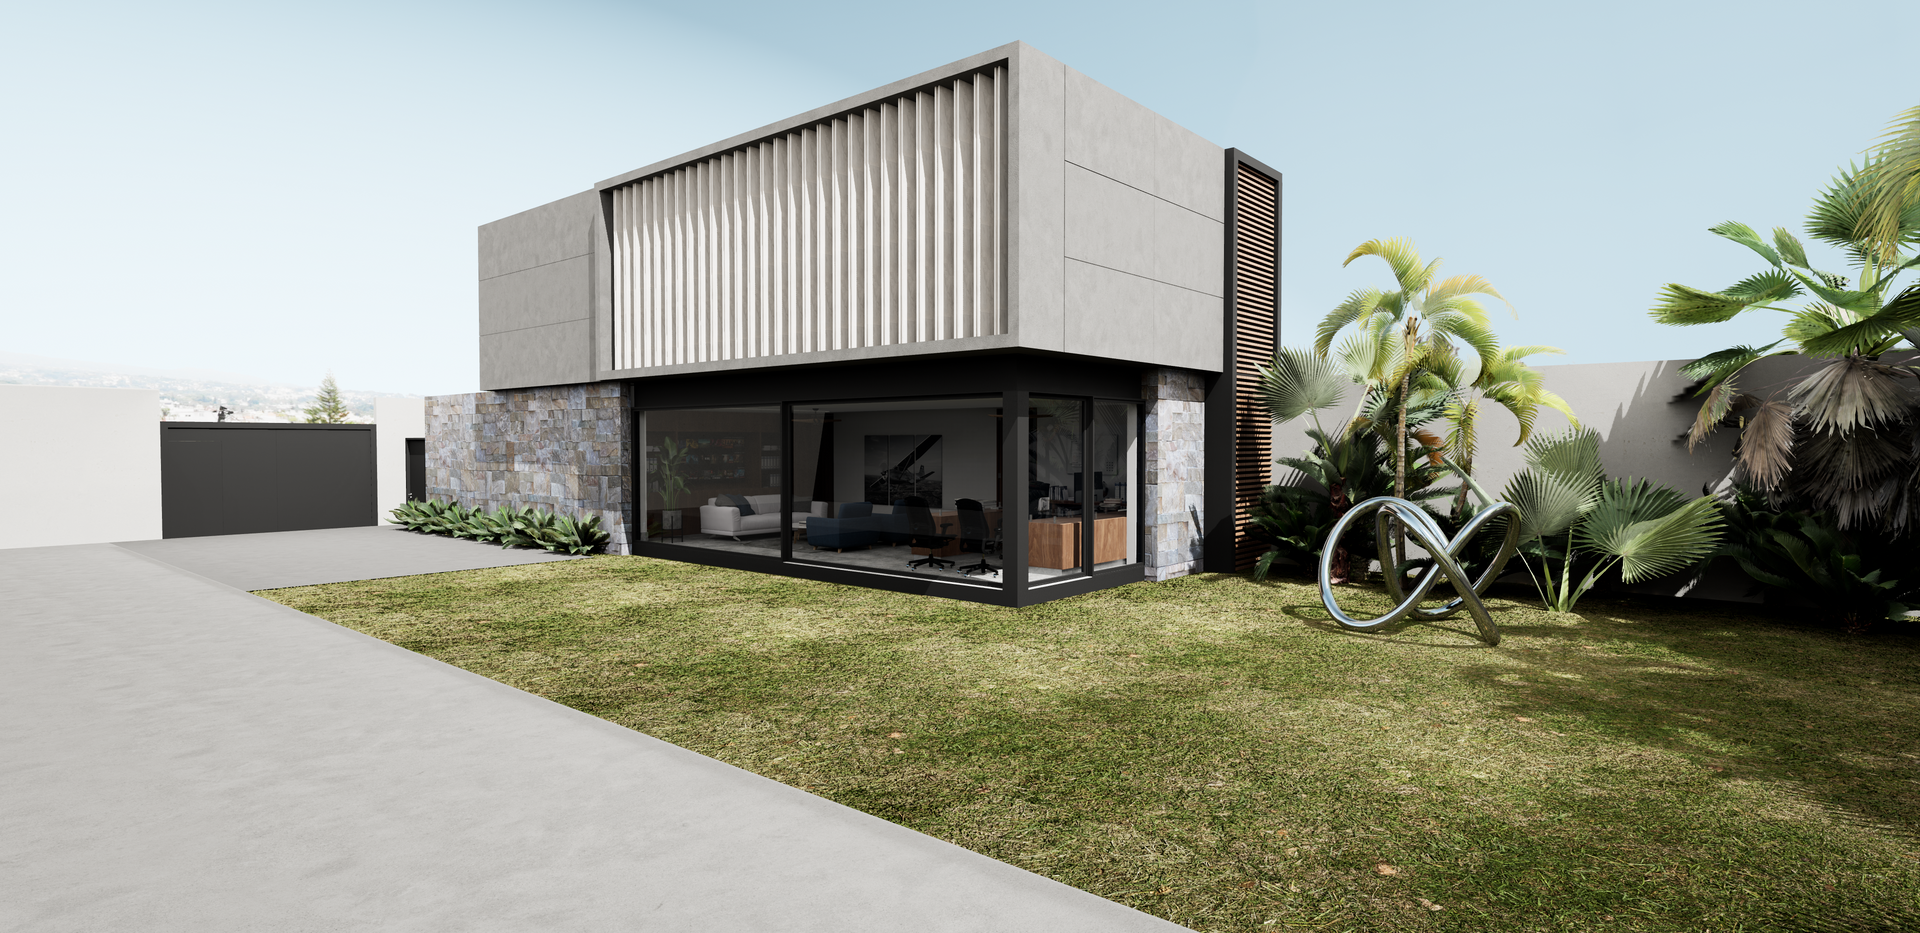 UR-DM Arquitectos Oficinas-Render 19.png